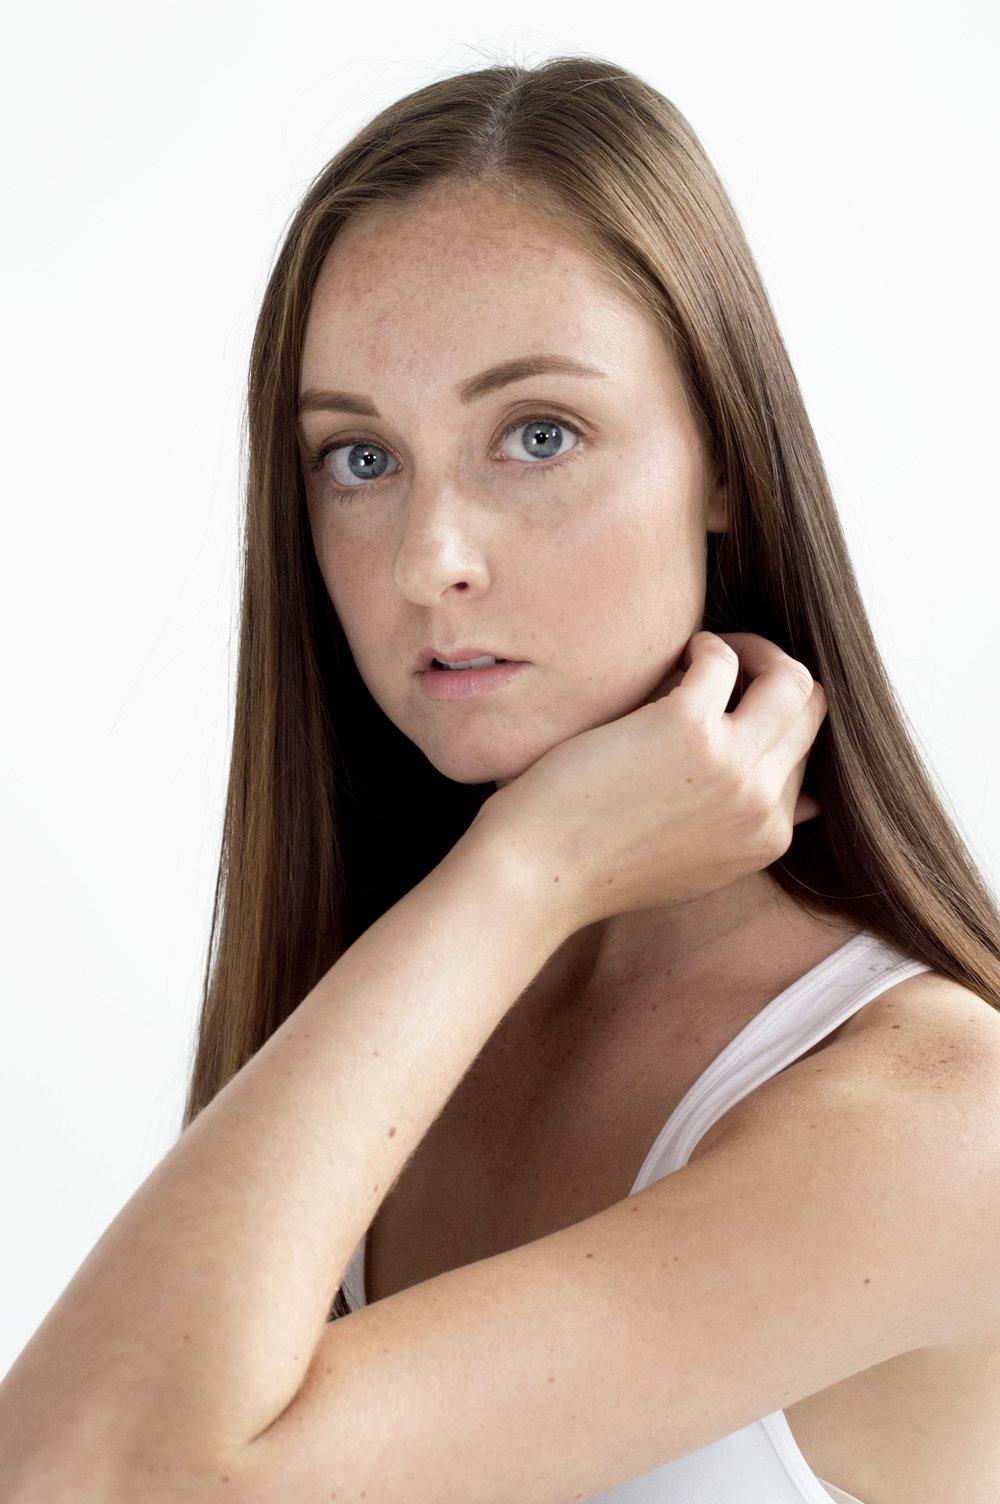 Model: Kristen Macdonald for Numa Models  Photo/Marketing : Ayden Creative